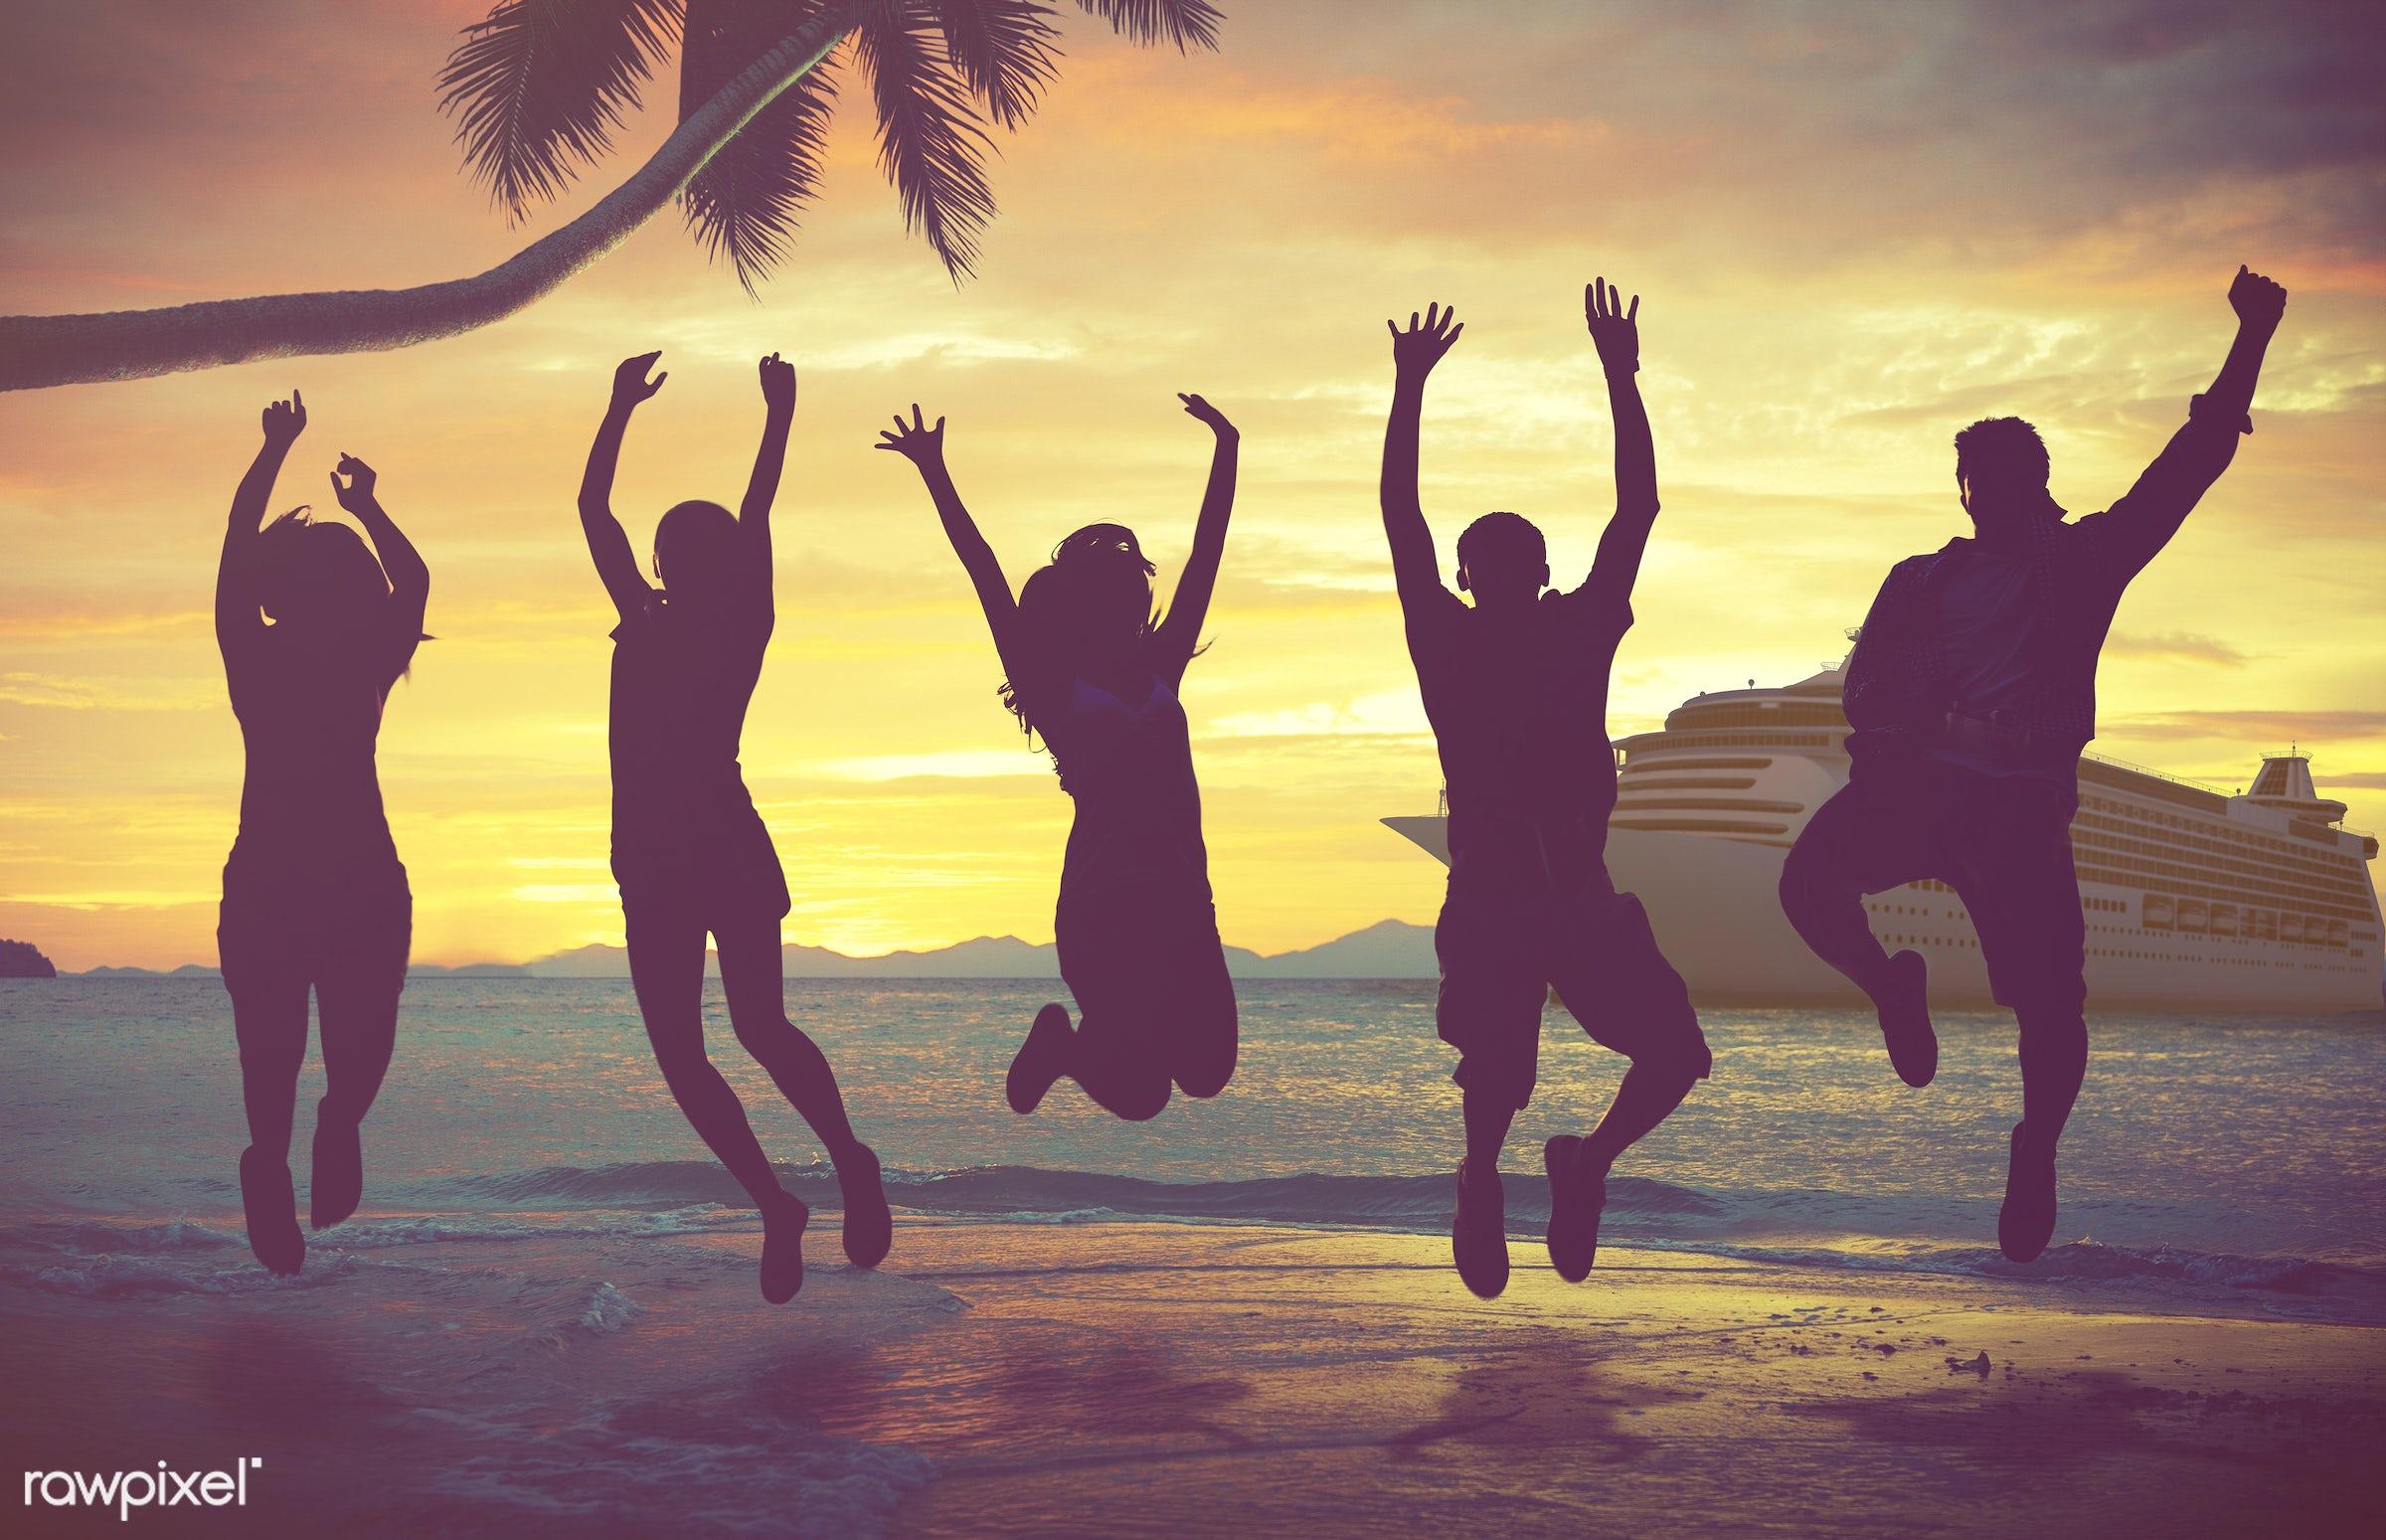 3d, beach, caribbean, cloud, cloudscape, coconut palm tree, cruise, cruise ship, destination, dock, freshness, friends,...